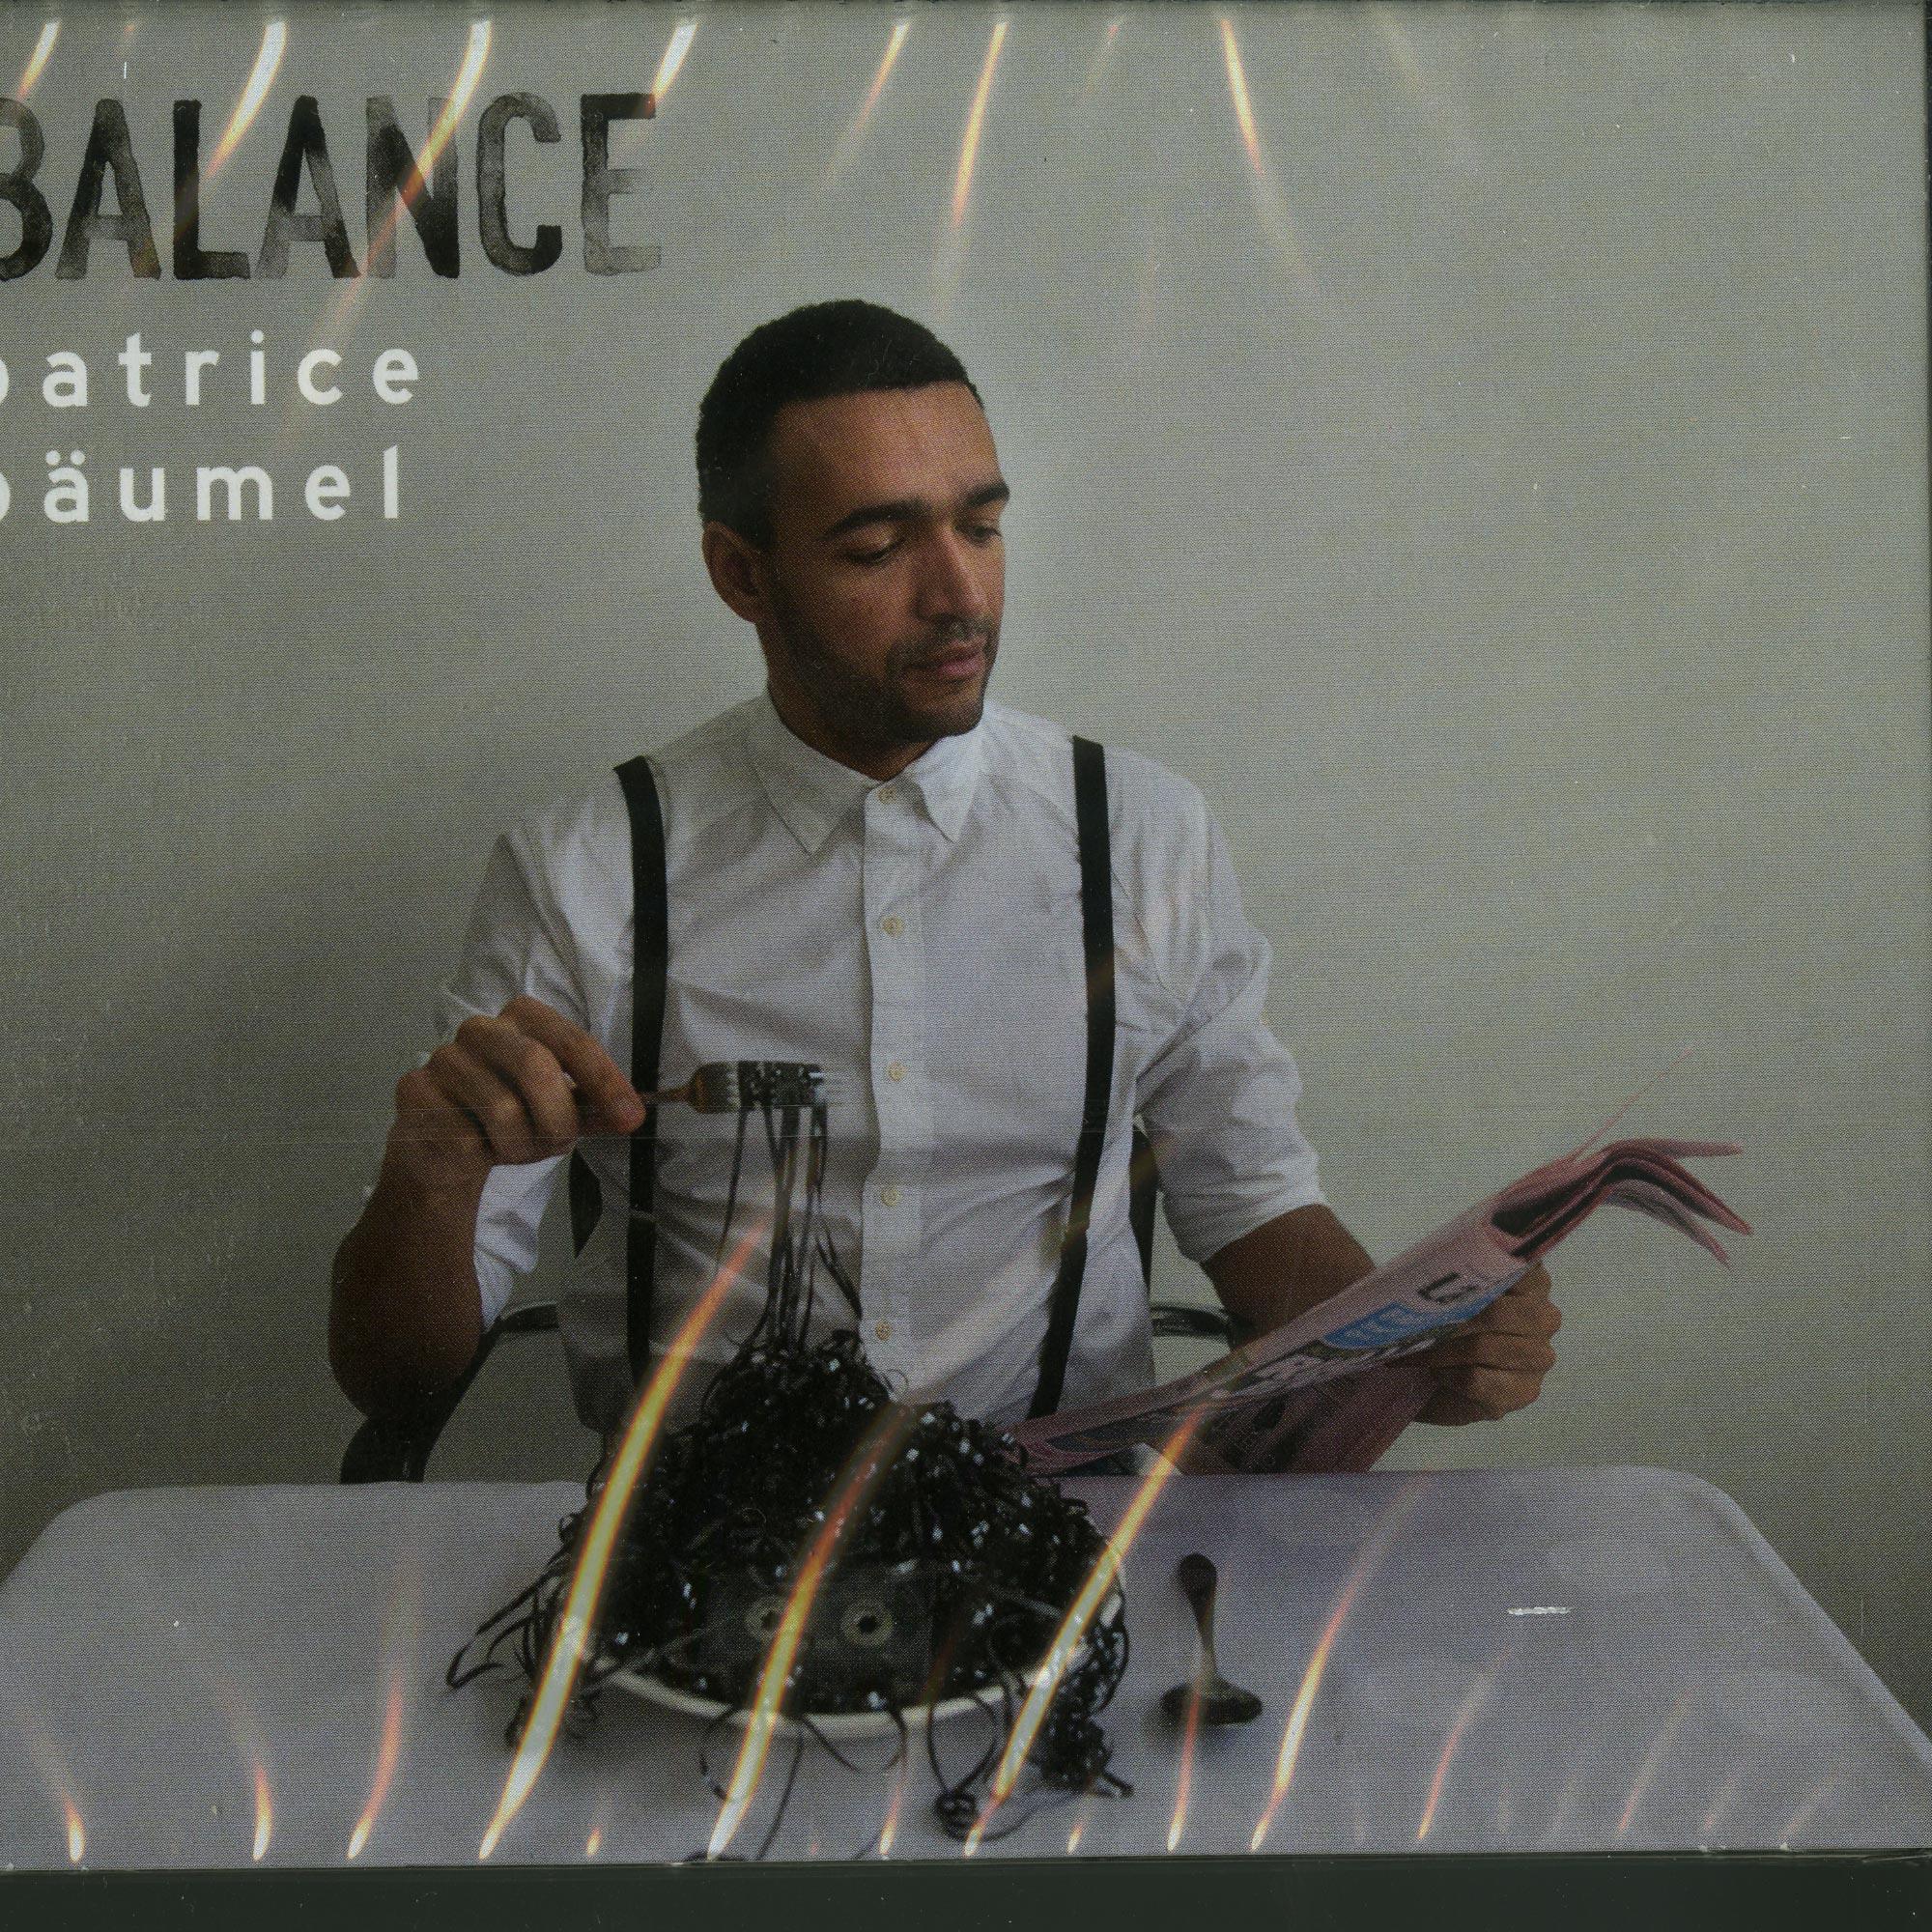 Patrice Baeumel - BALANCE PRESENTS PATRICE BAEUMEL